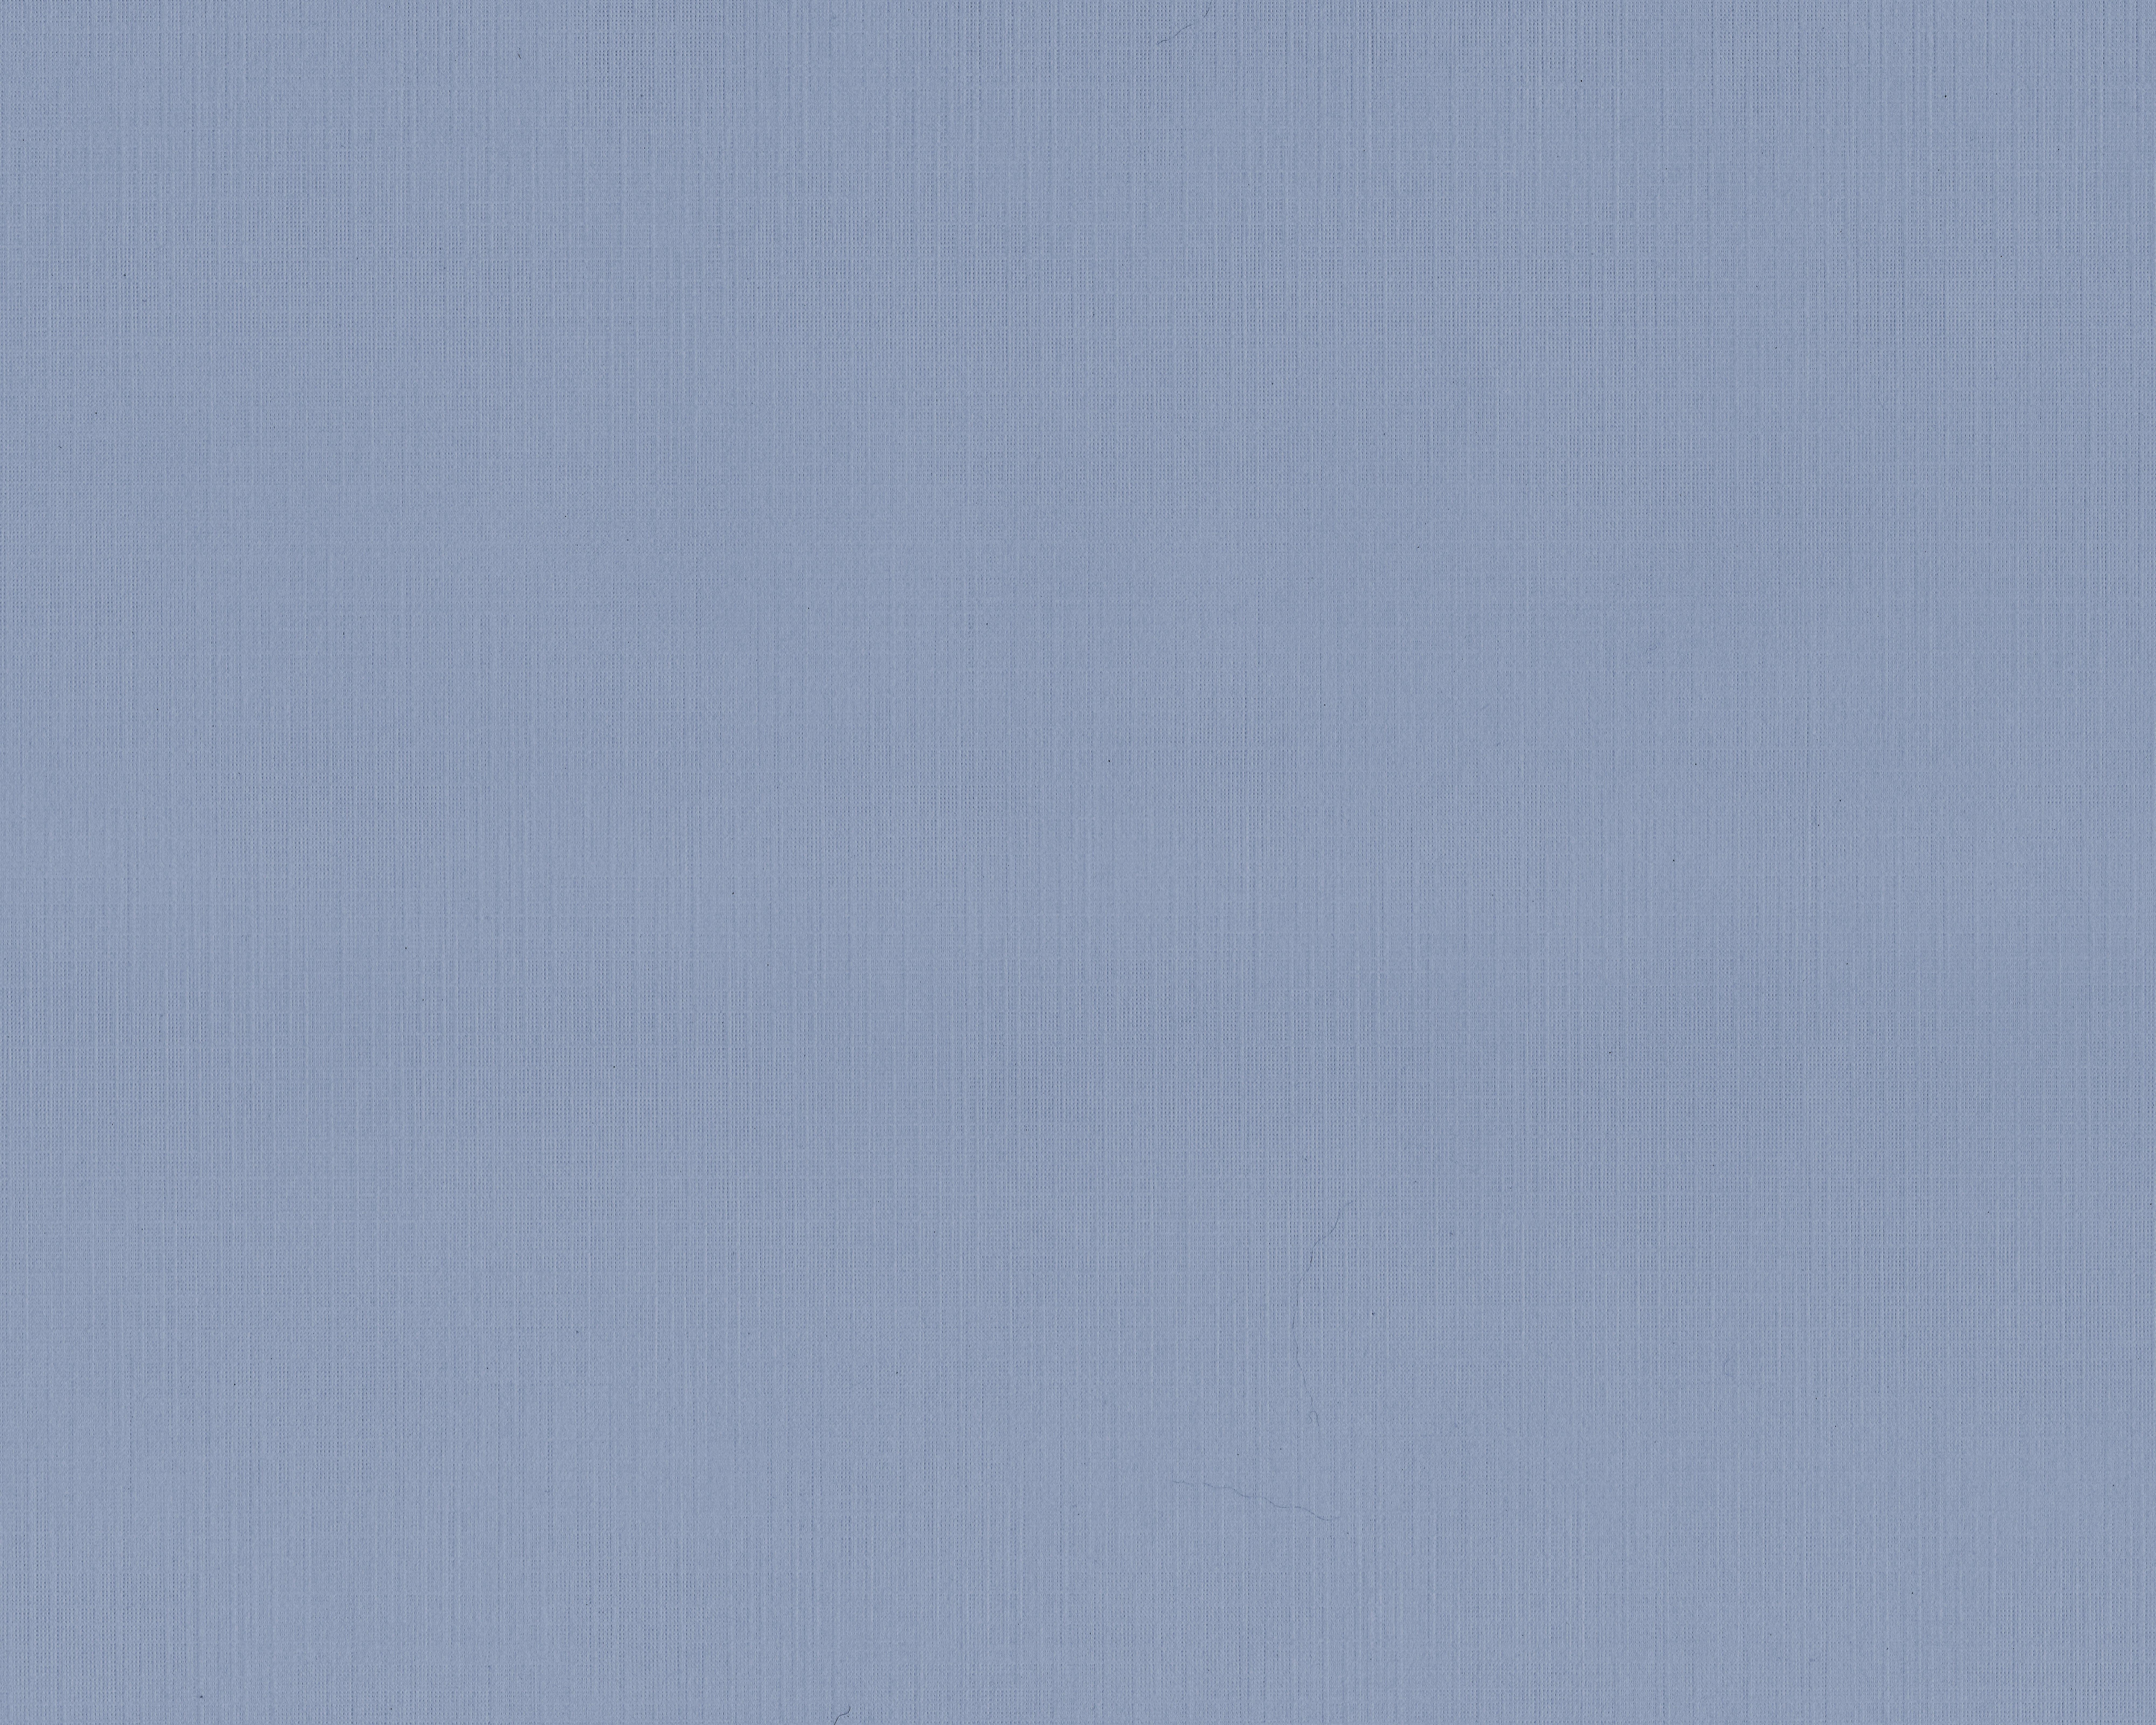 Blue Gray Linen Paper Texture Picture Free Photograph